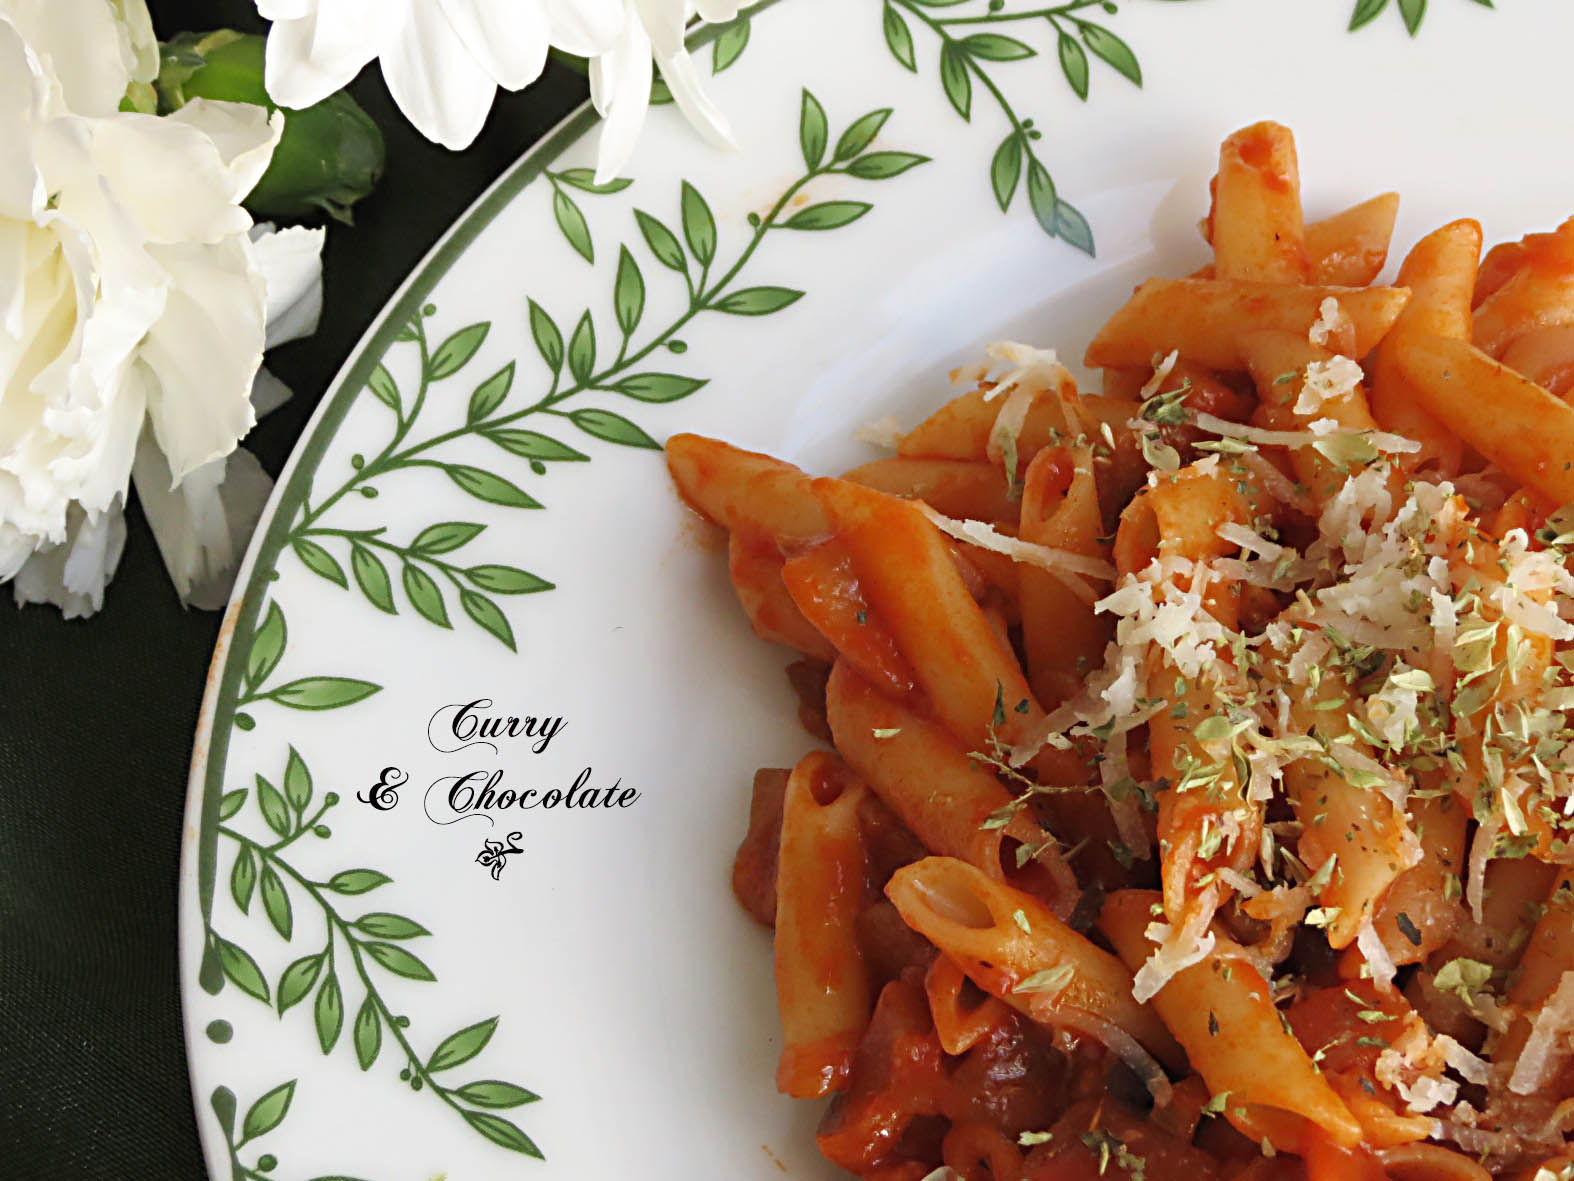 Macarrones con berenjena y tomate  - Pasta with tomato and eggplant